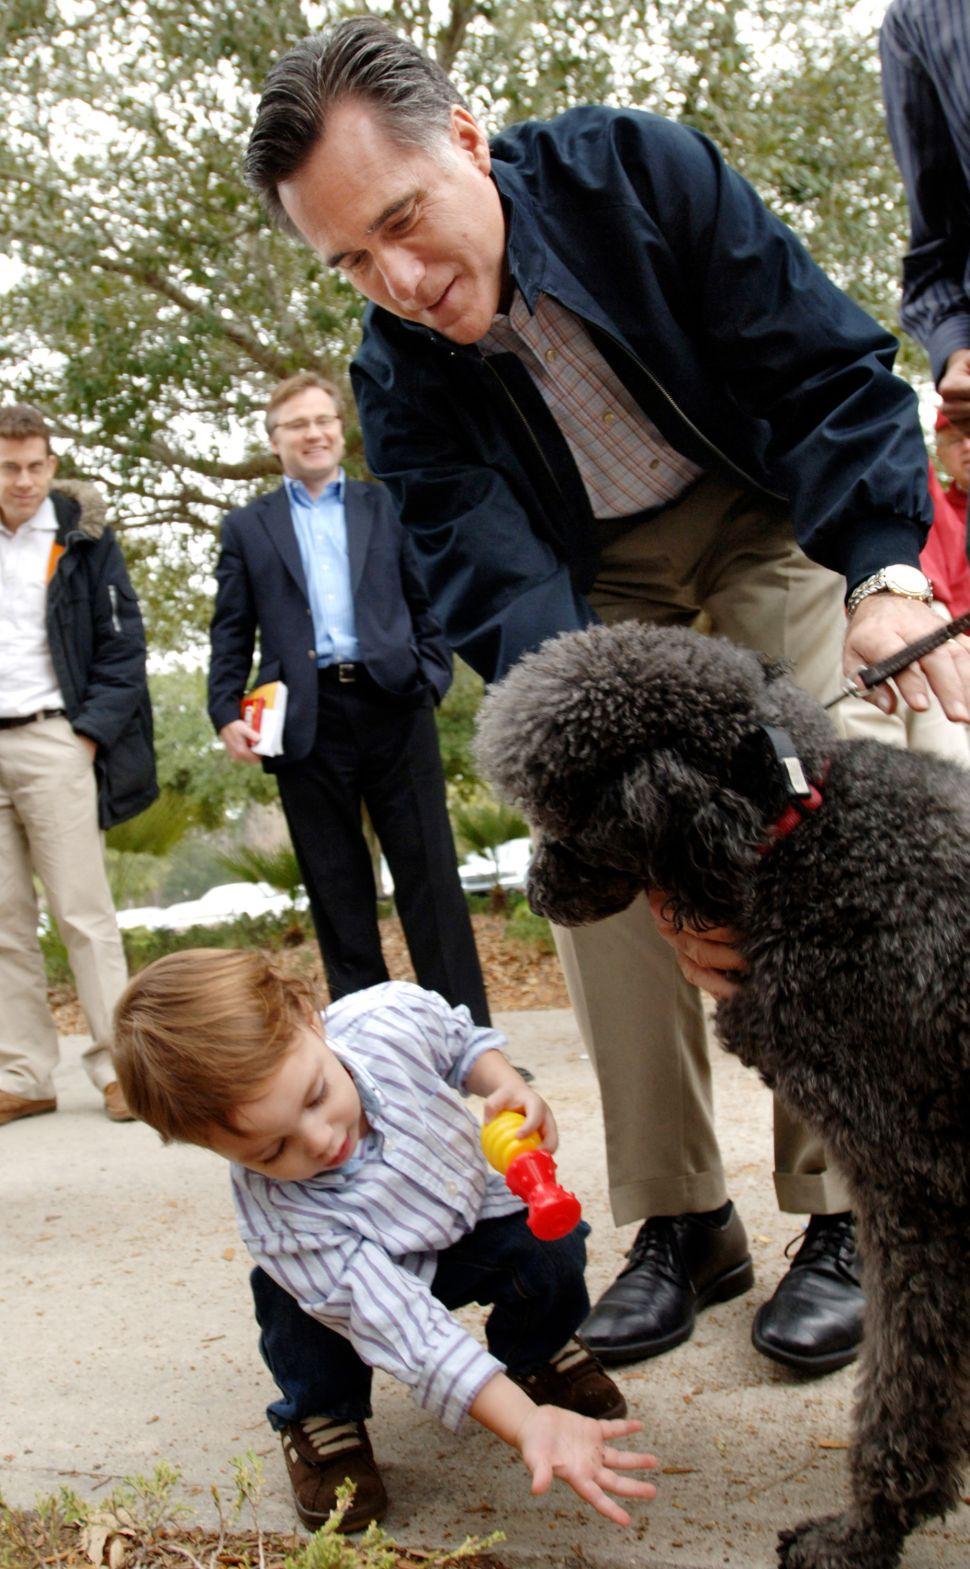 Mitt Romney's Dog Debacle Debated in Oregon Court